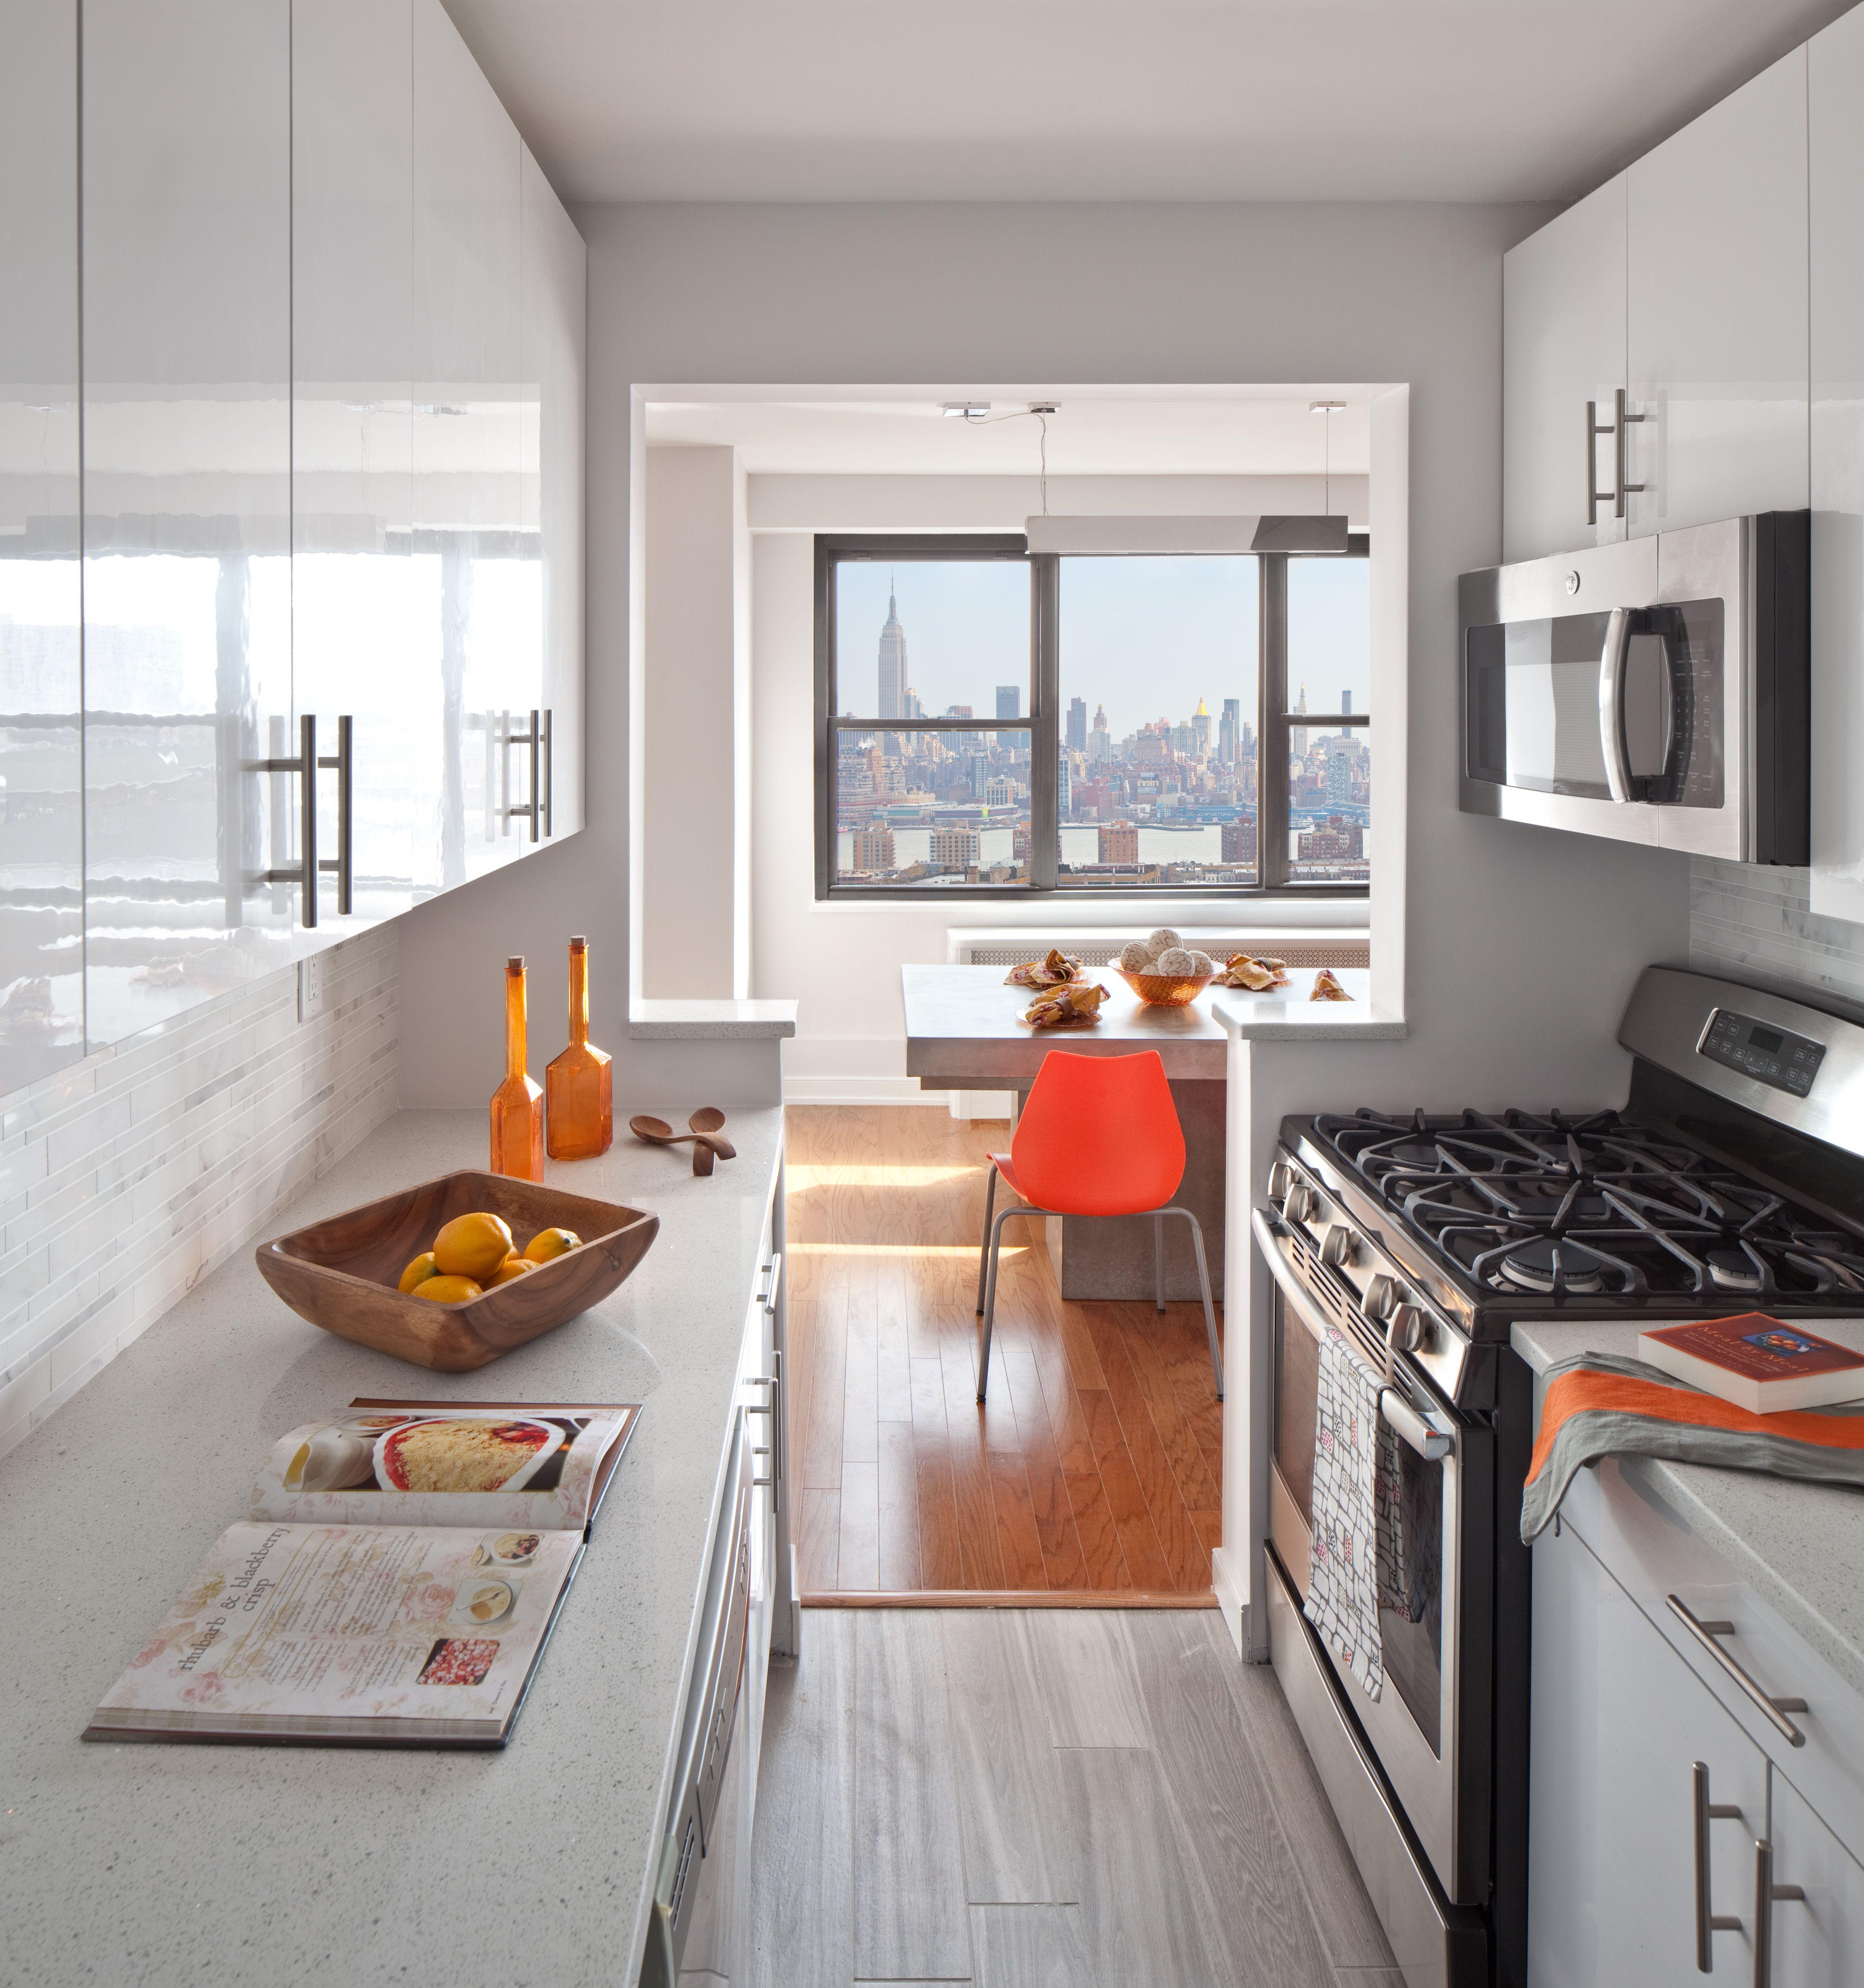 The Lenox Condominiums Union City, NJ In New Jersey